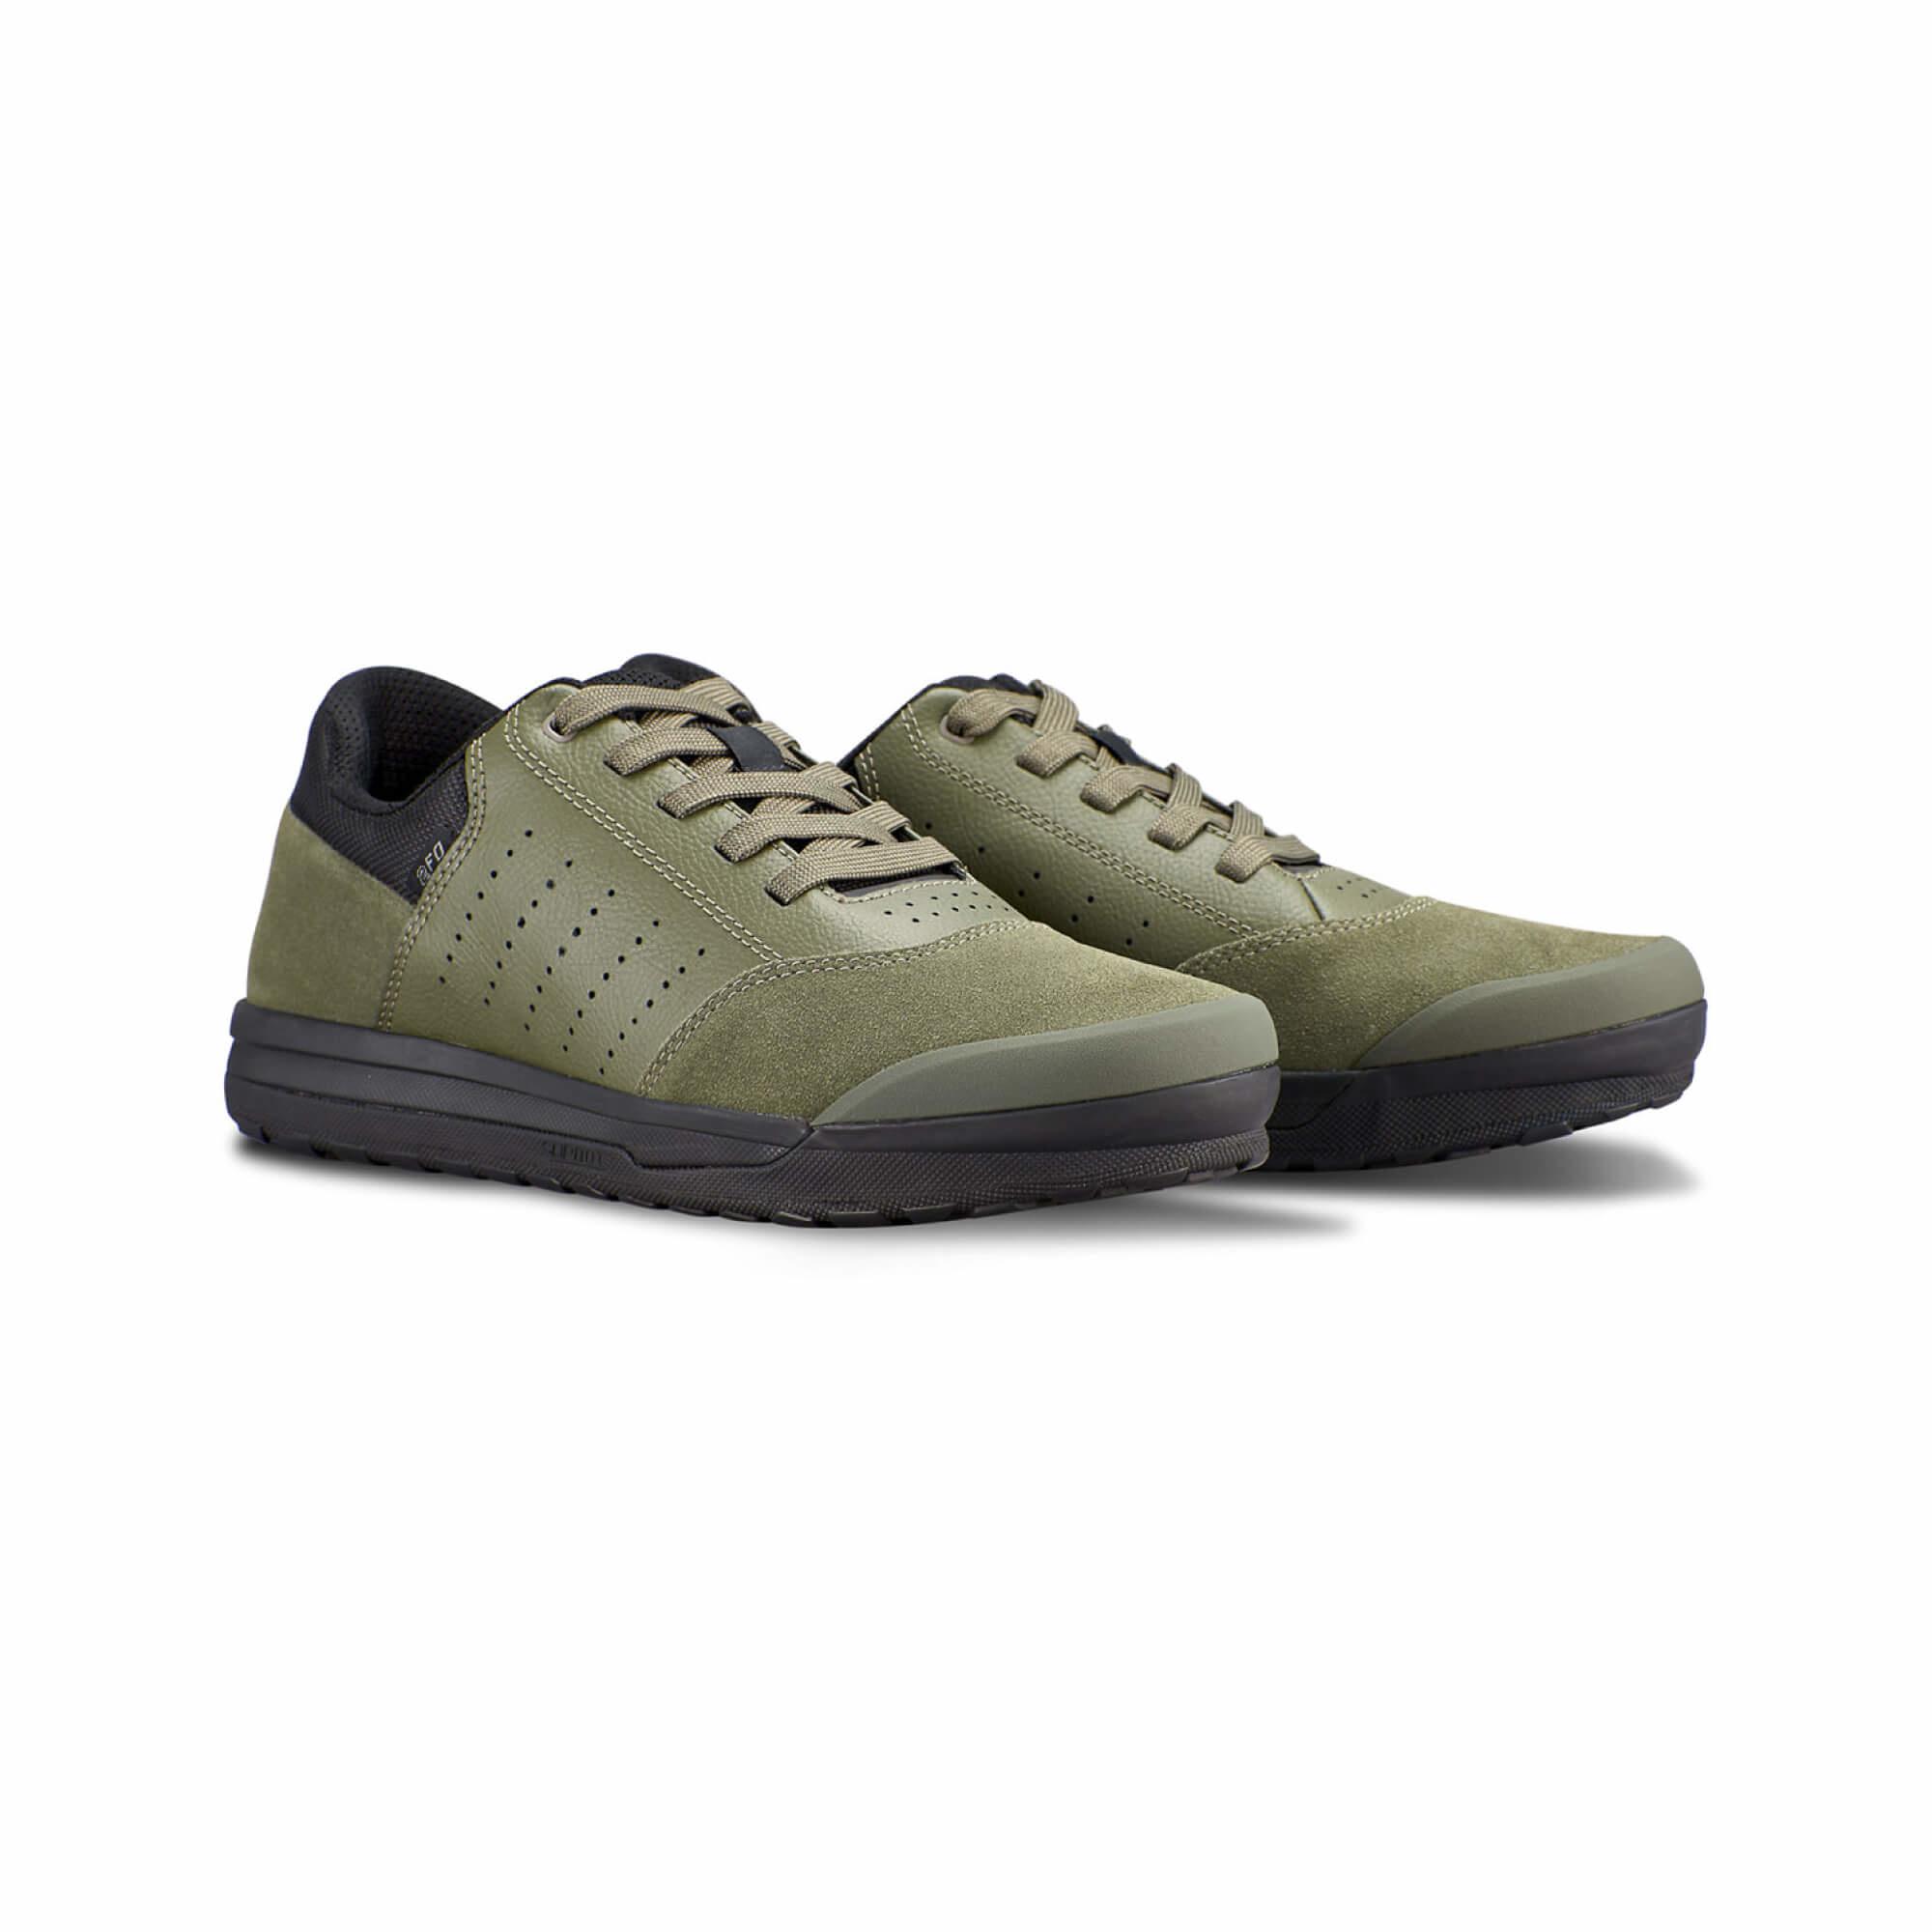 2FO Roost Flat MTB Shoe-10